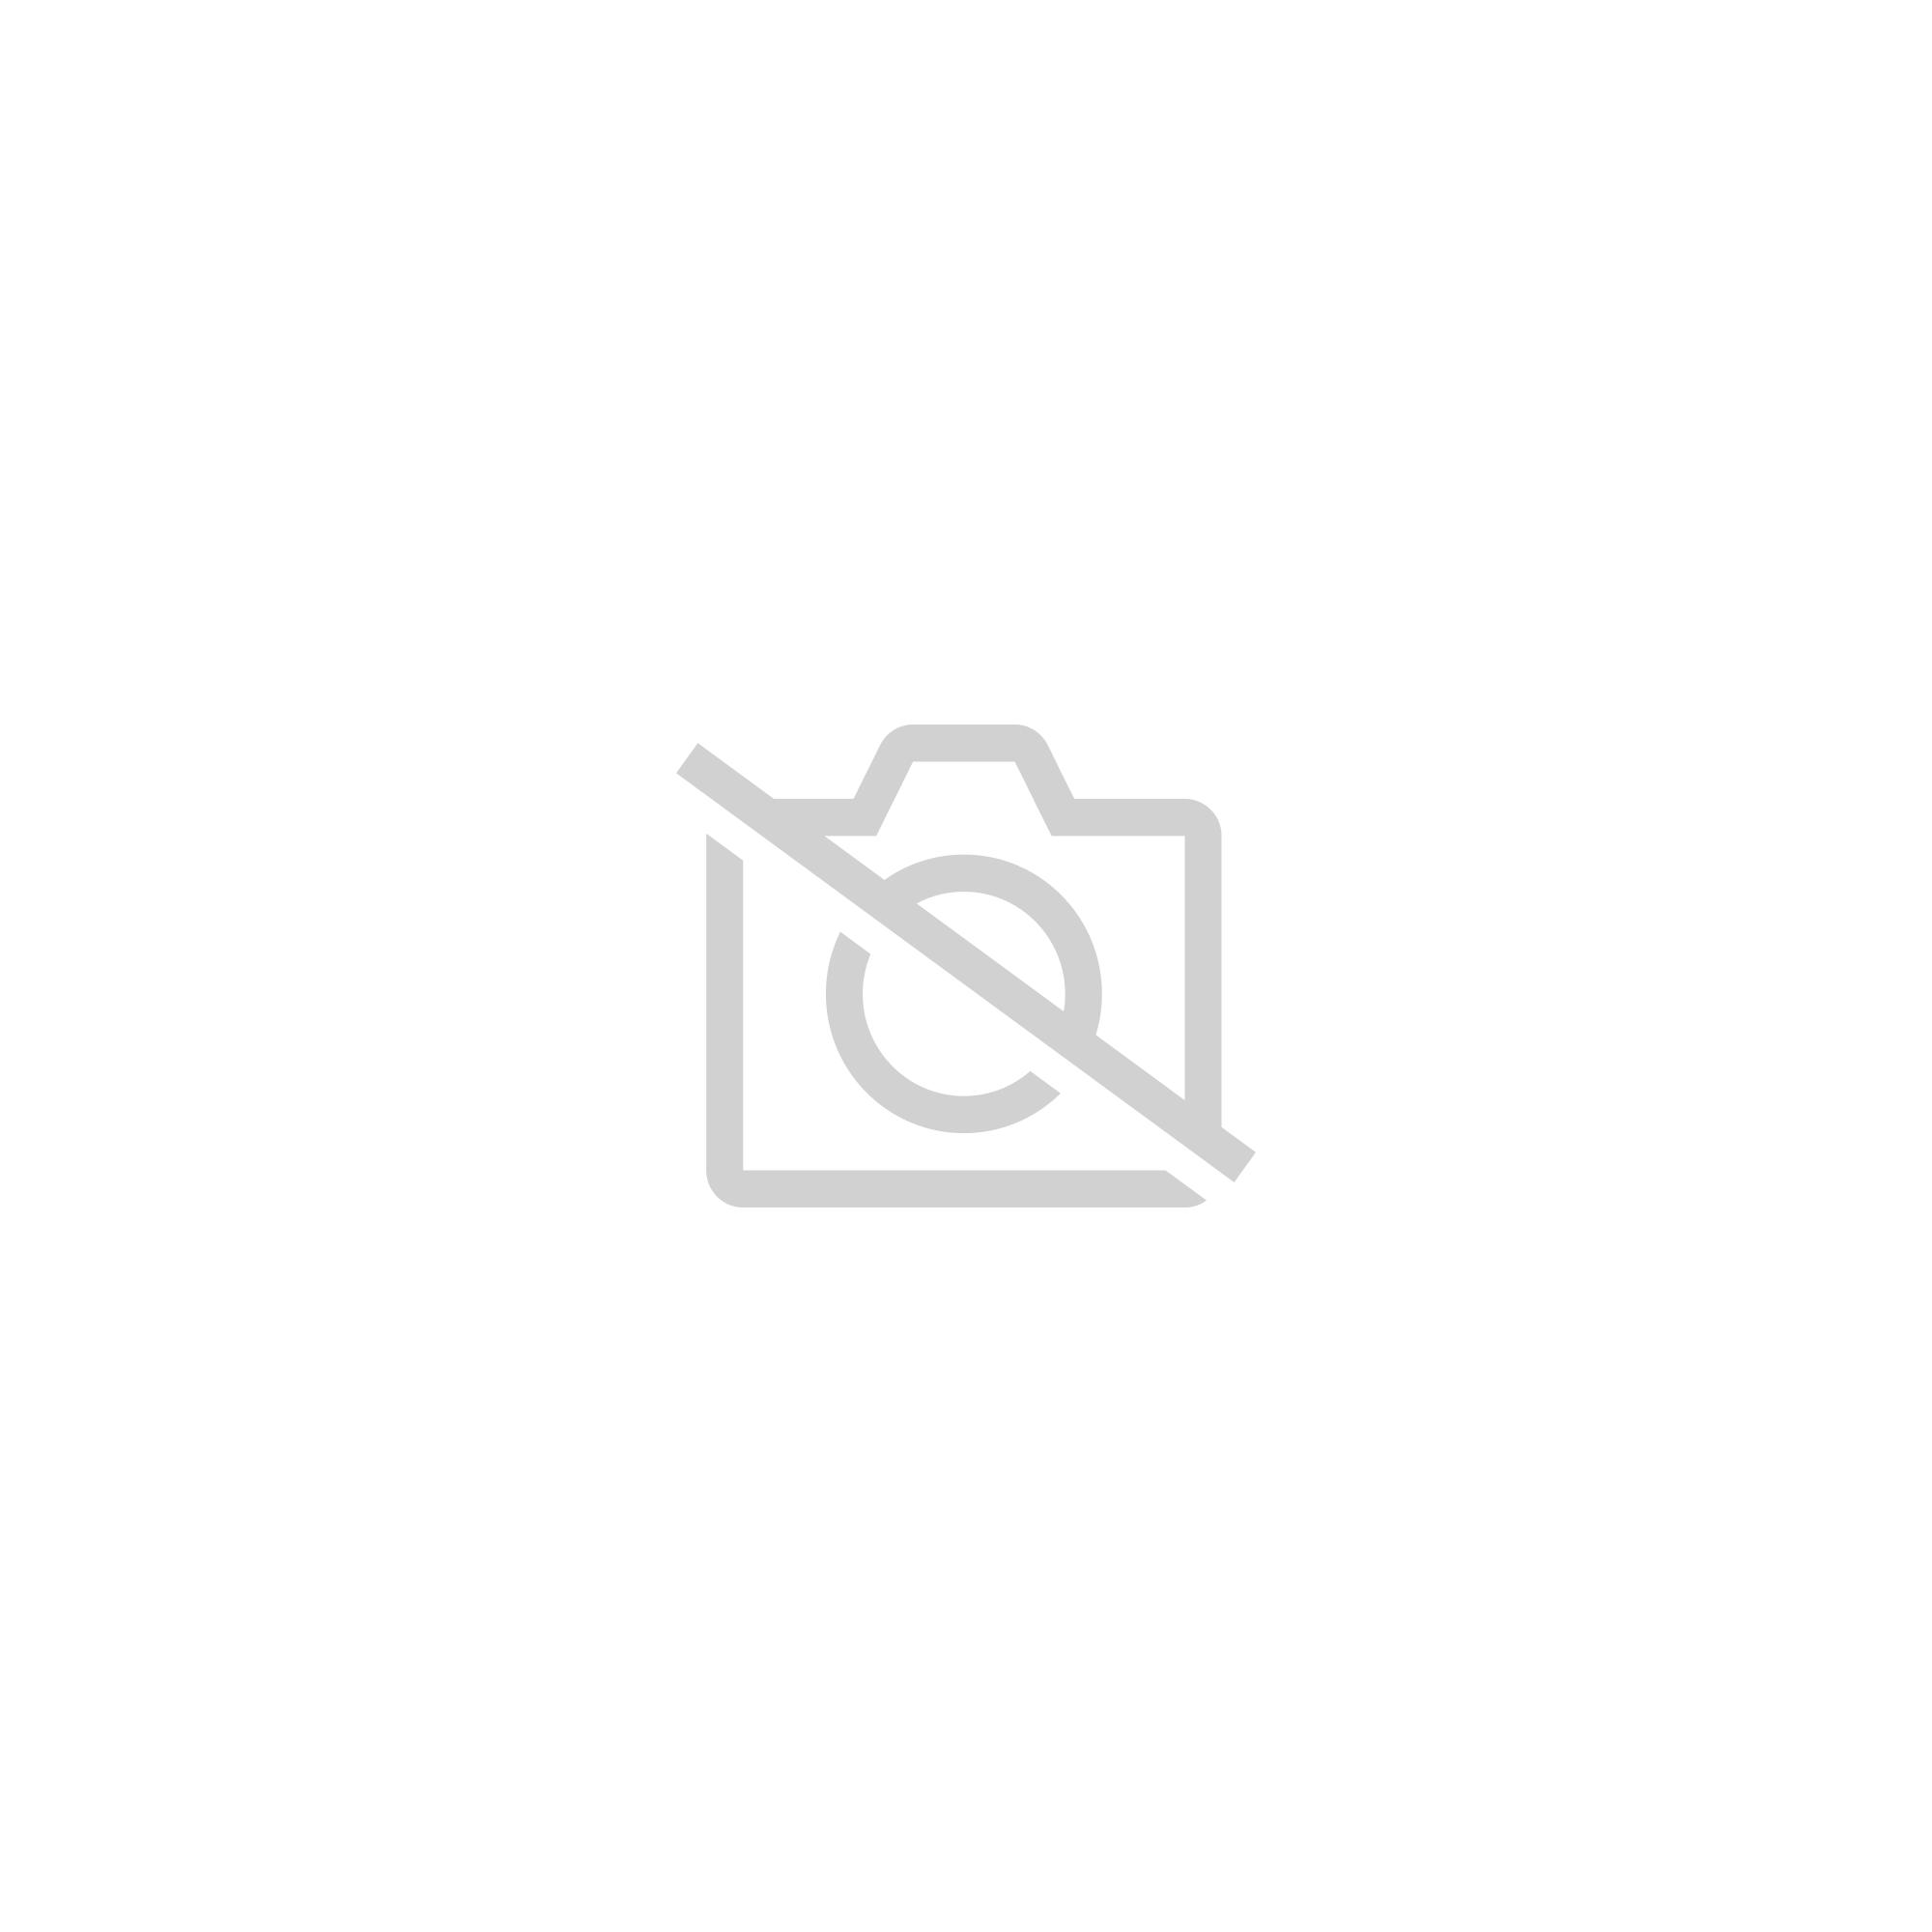 Revue Informatique - Internet pratique